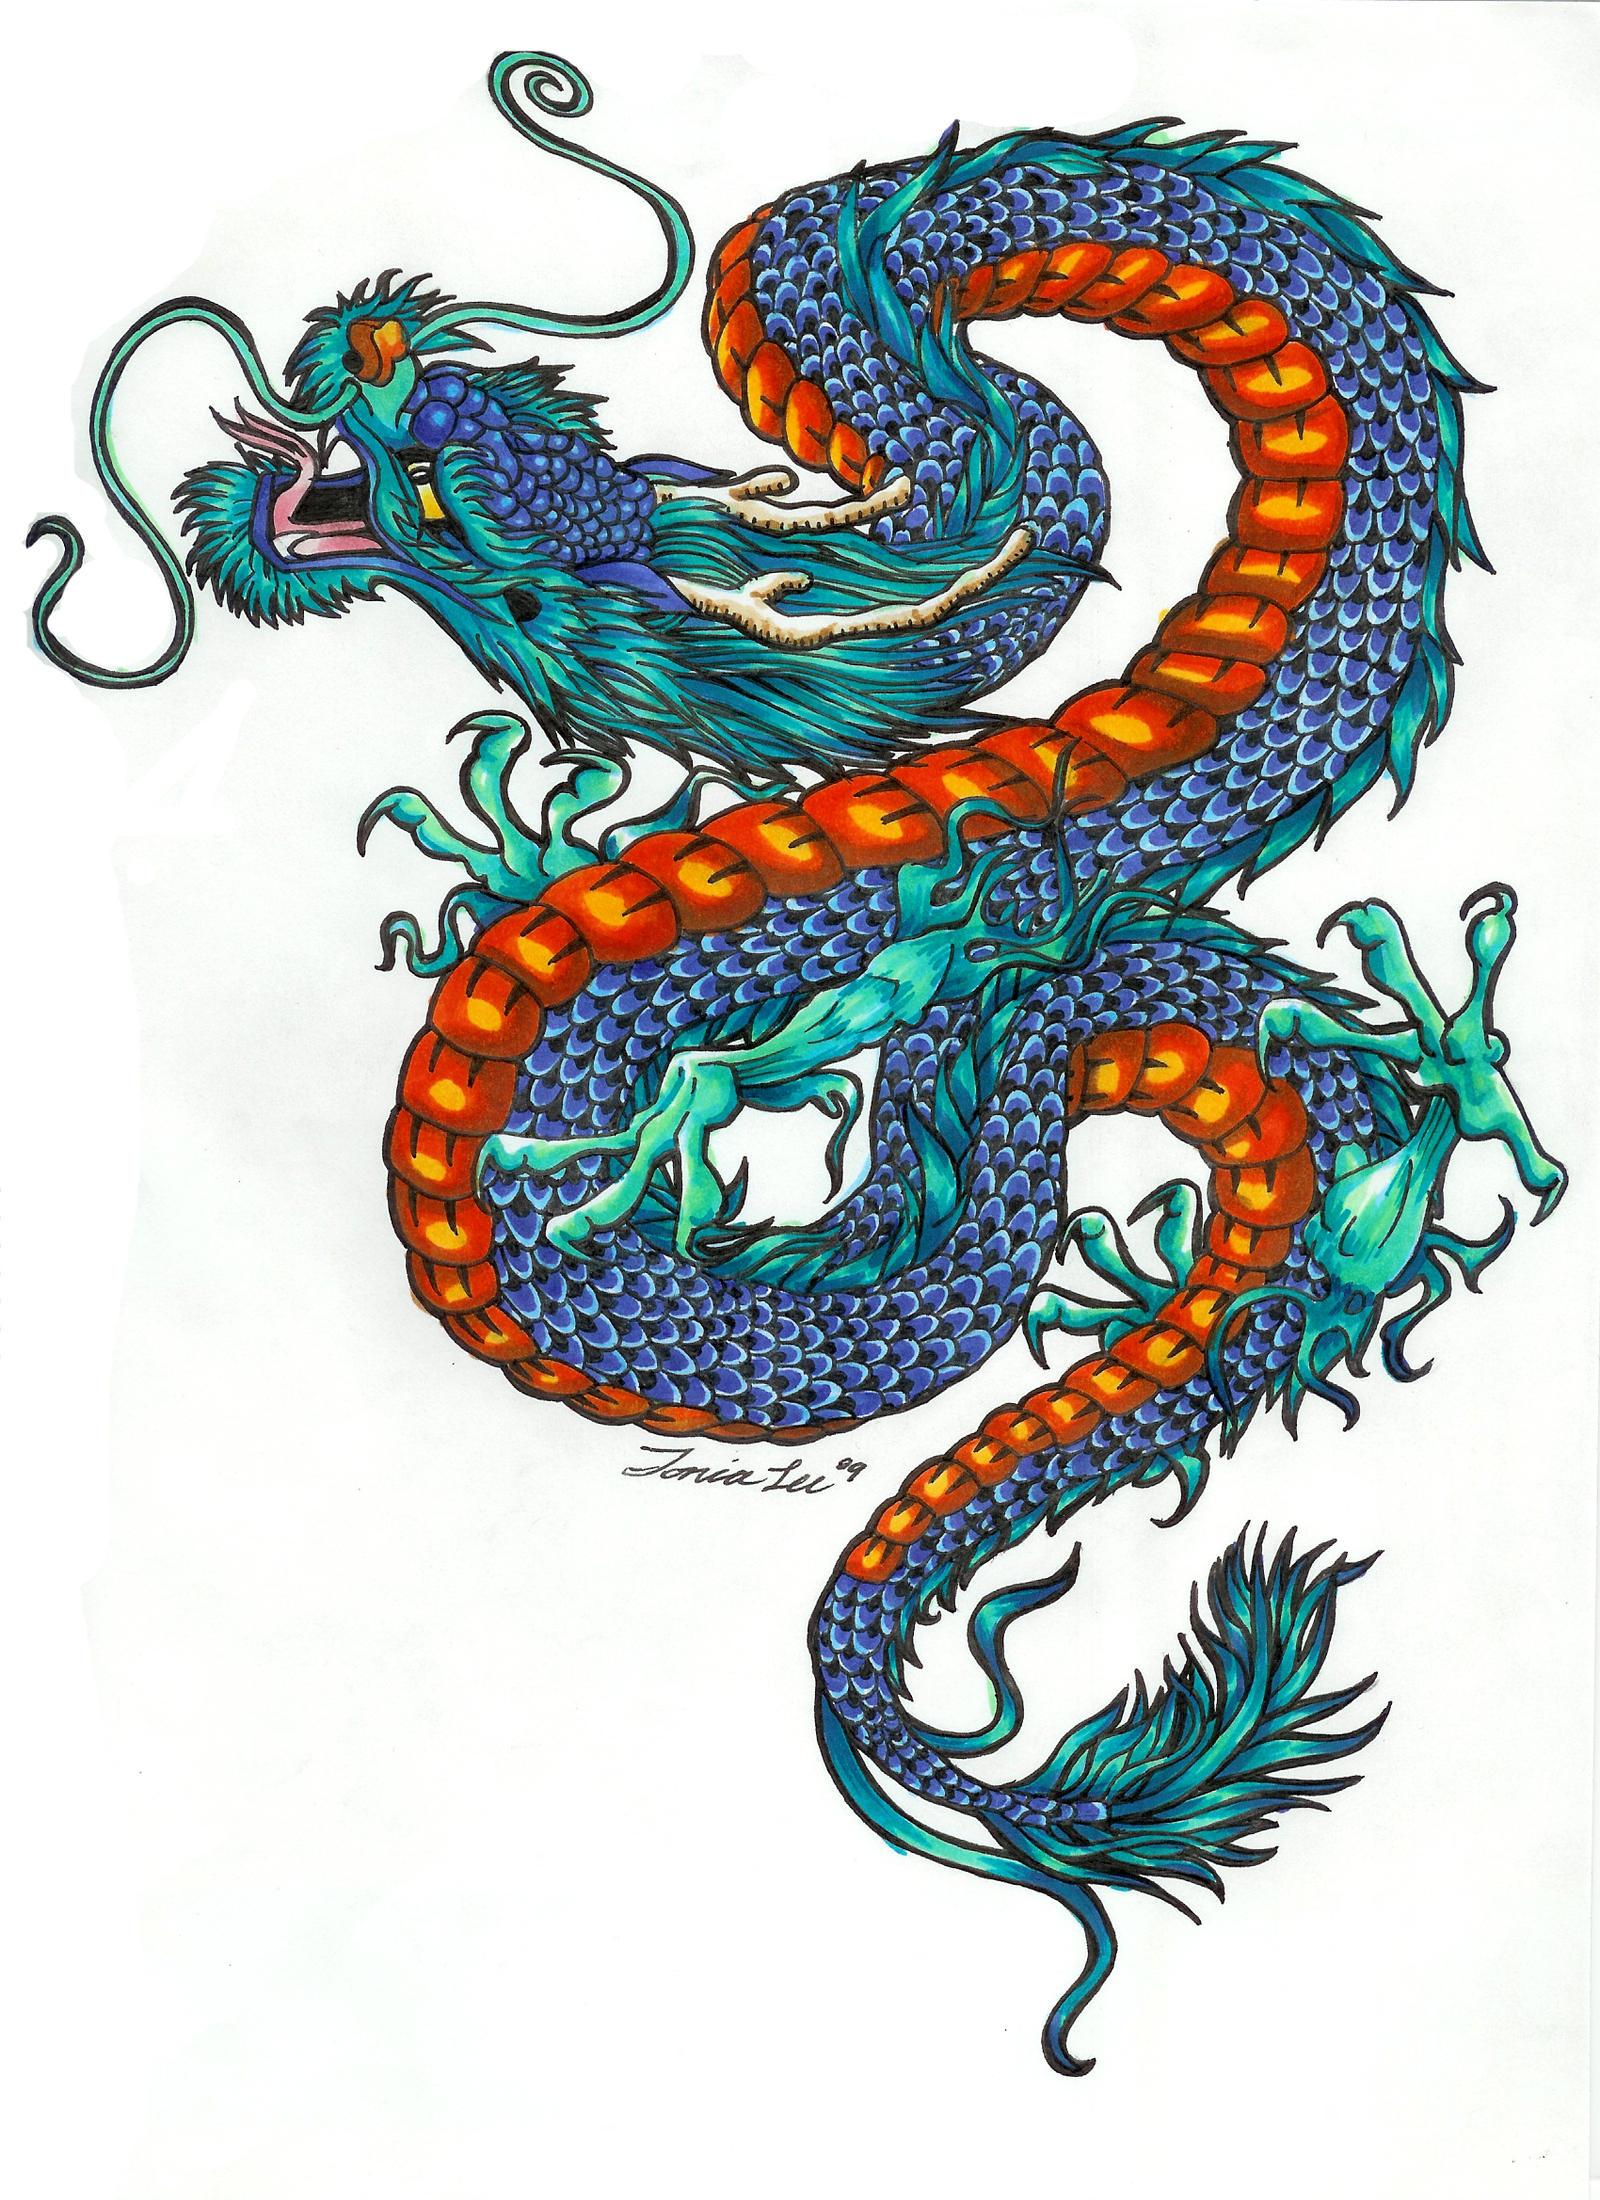 tattoo design dragon by raynehawk on deviantart. Black Bedroom Furniture Sets. Home Design Ideas